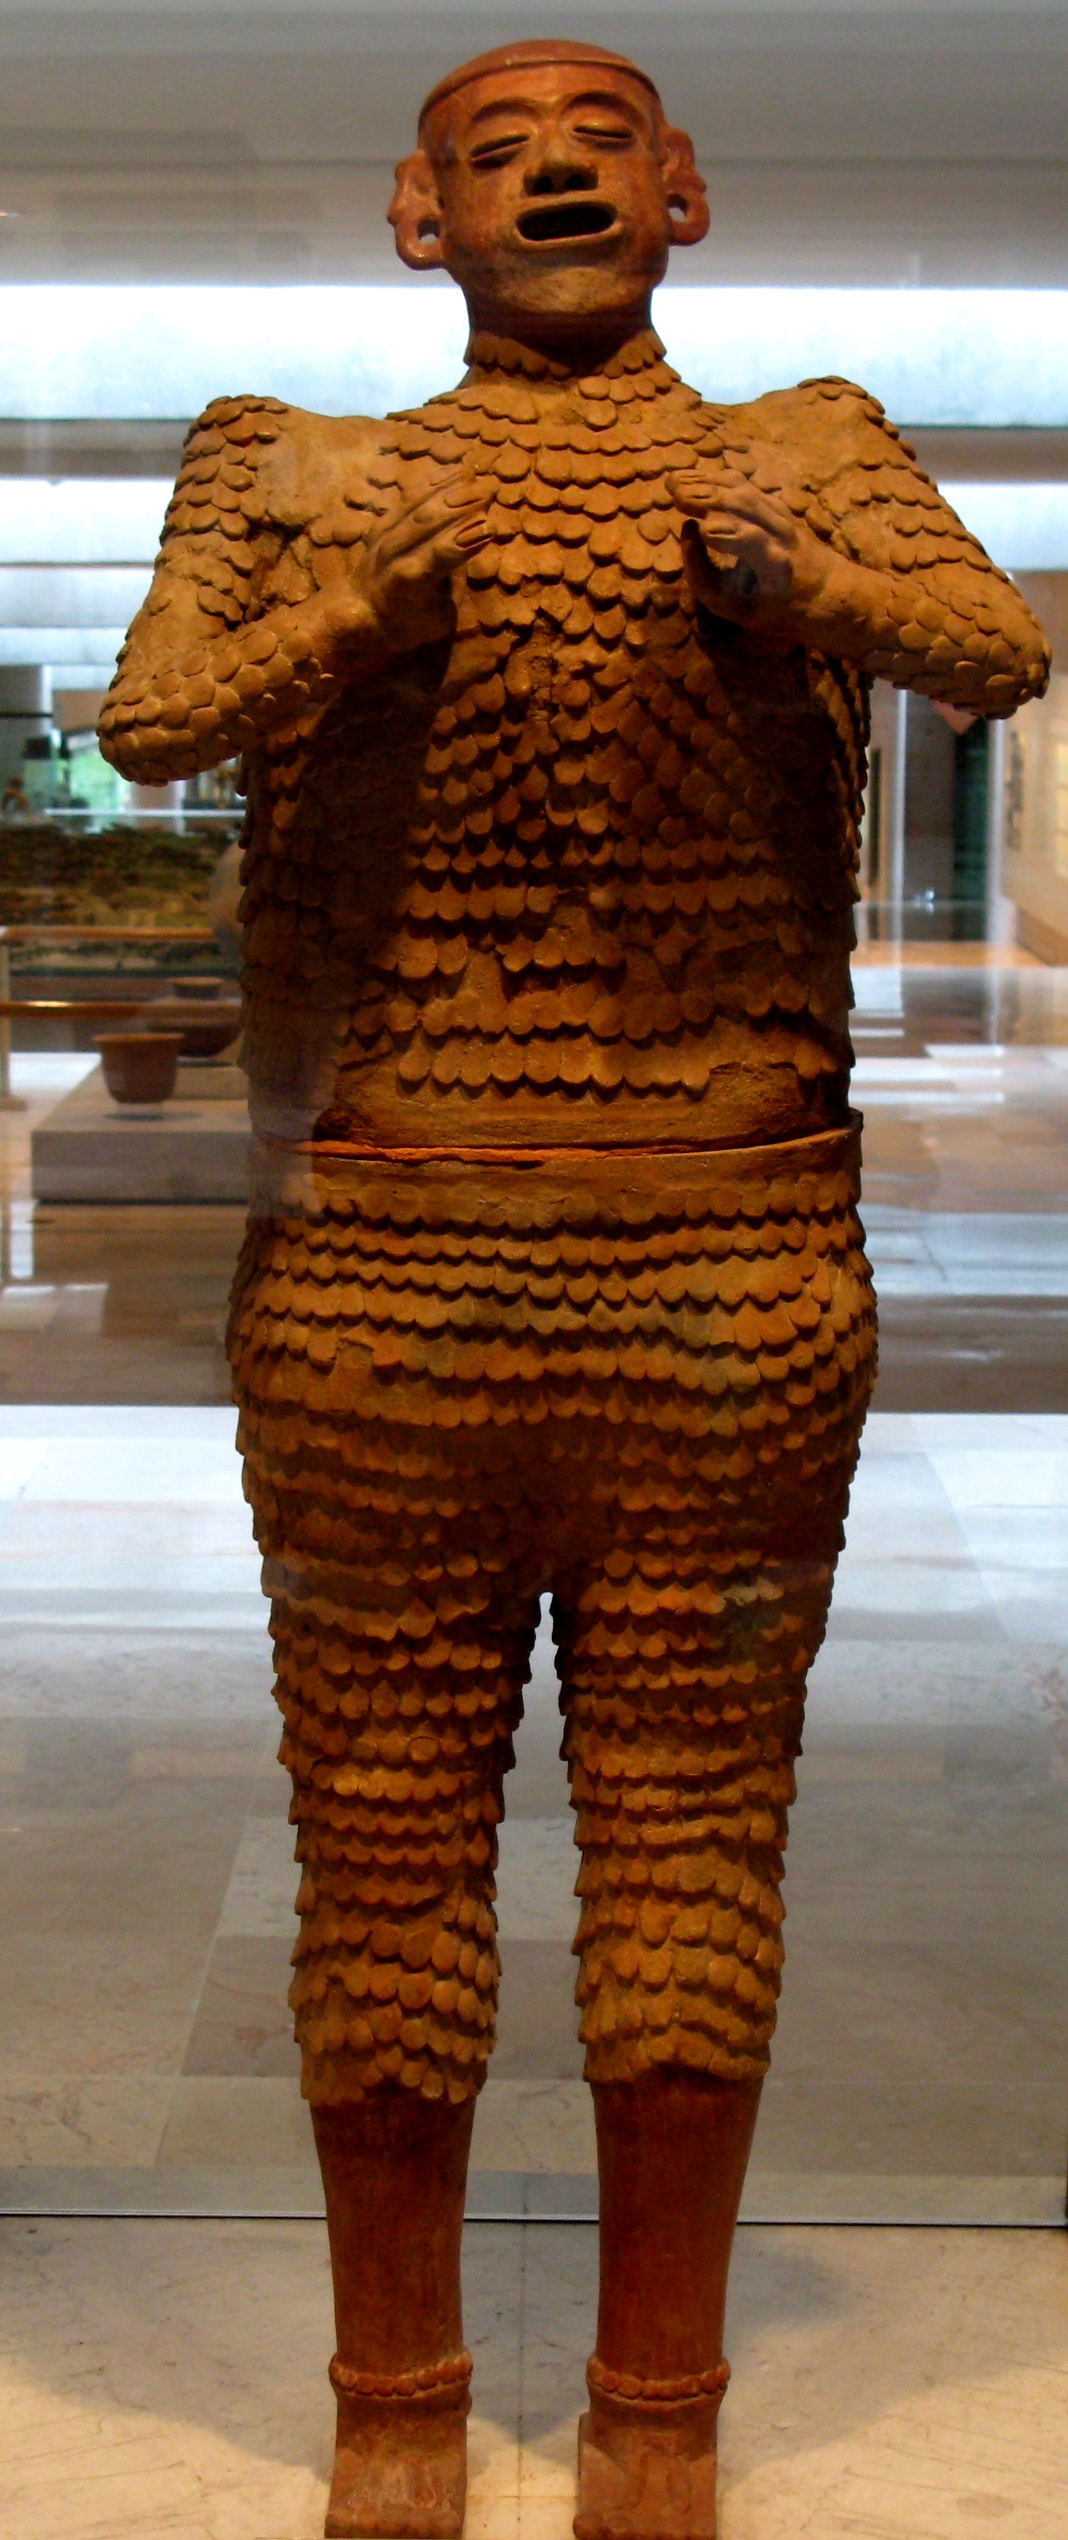 museo de antropologia xalapa: